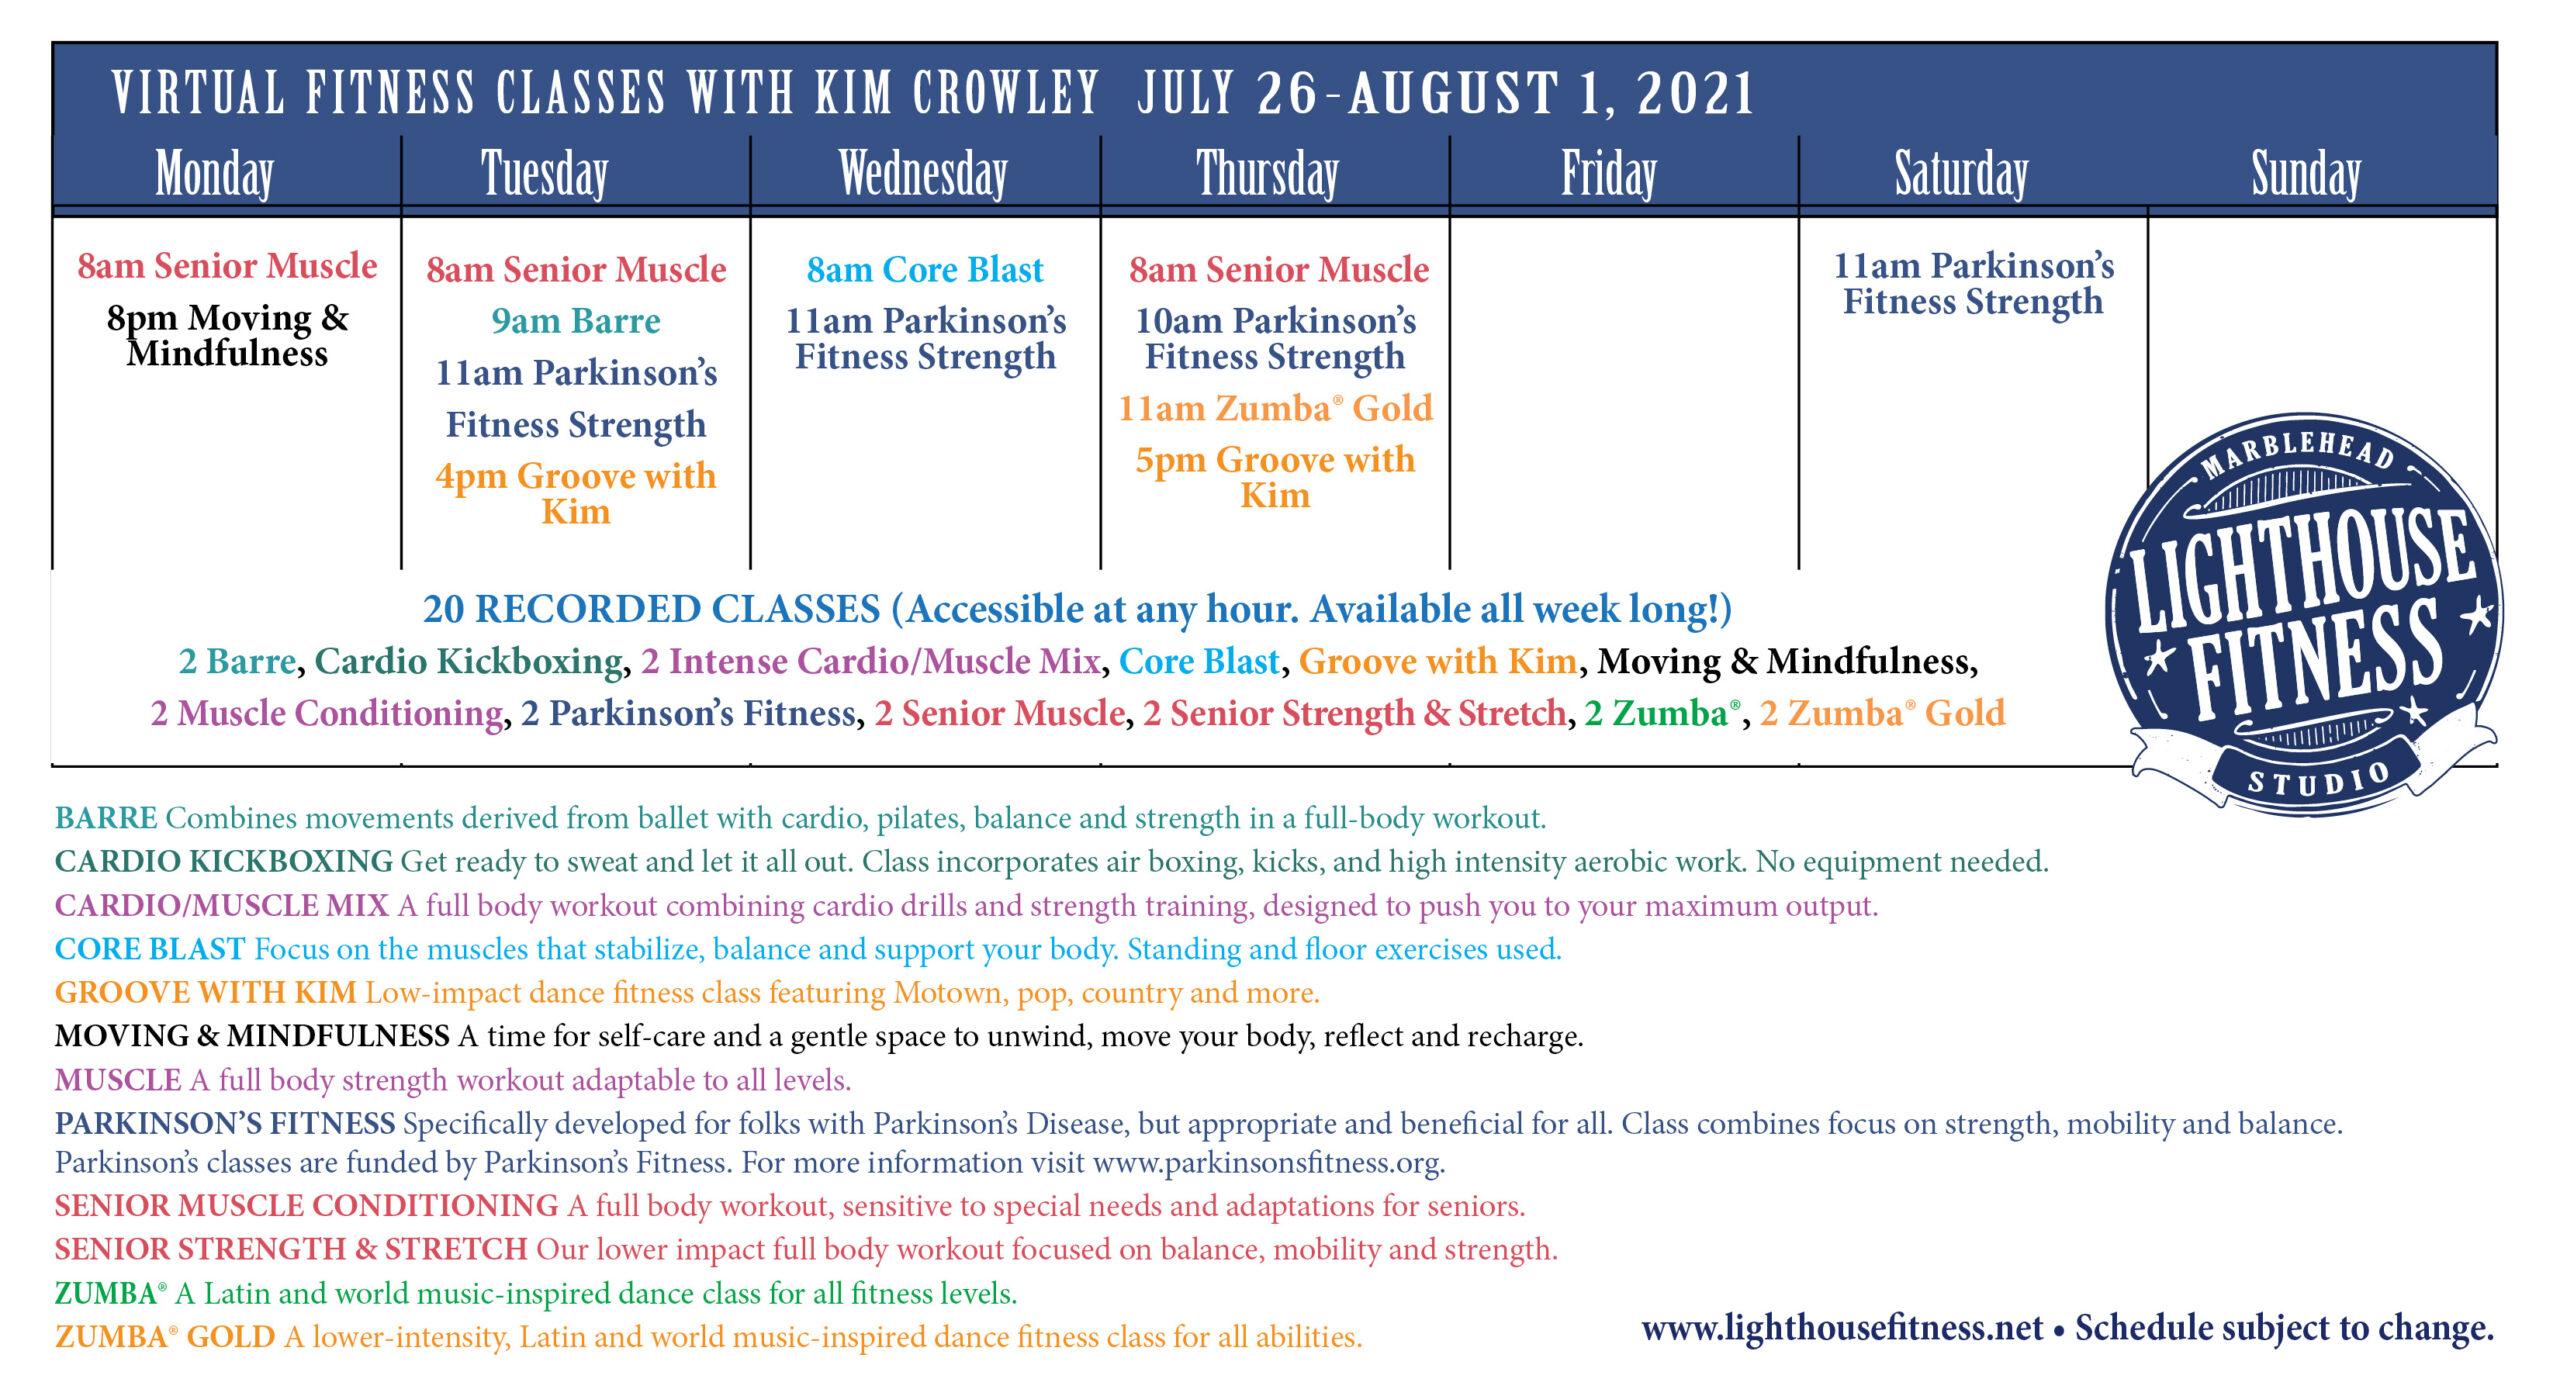 72621 week 2021 virtual class schedule